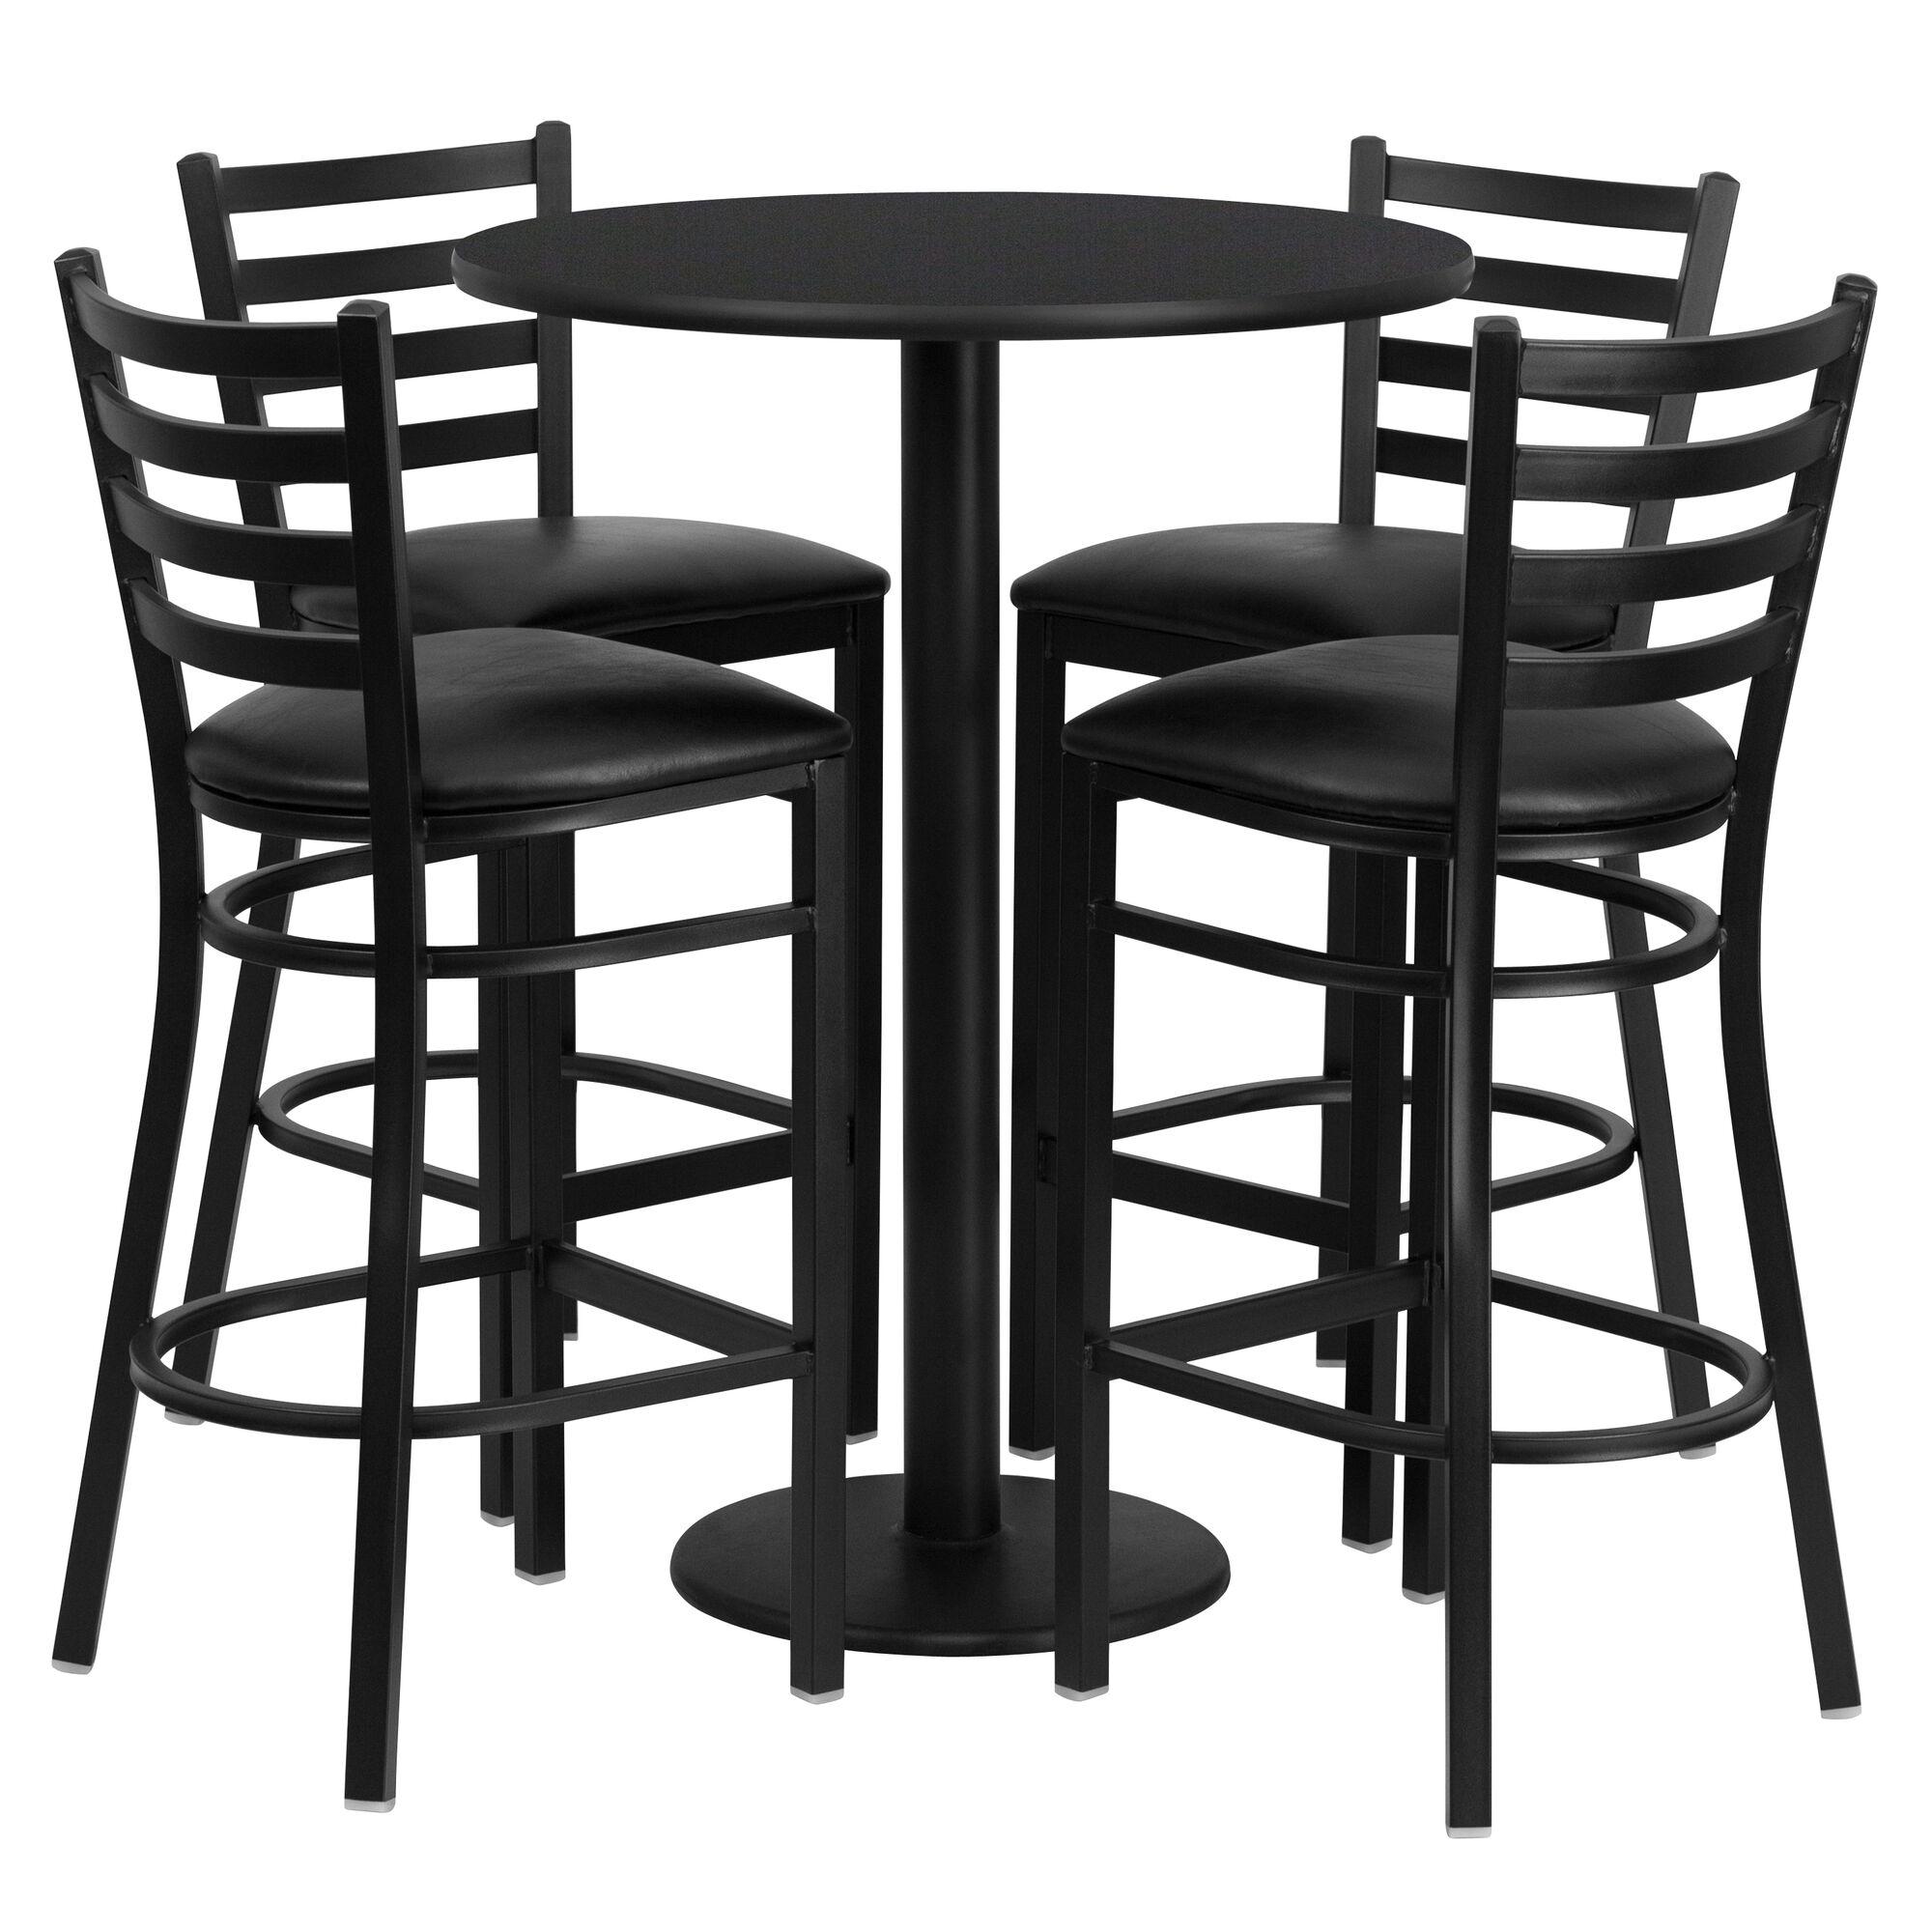 Rd bk bar table vyl seat rest tdr